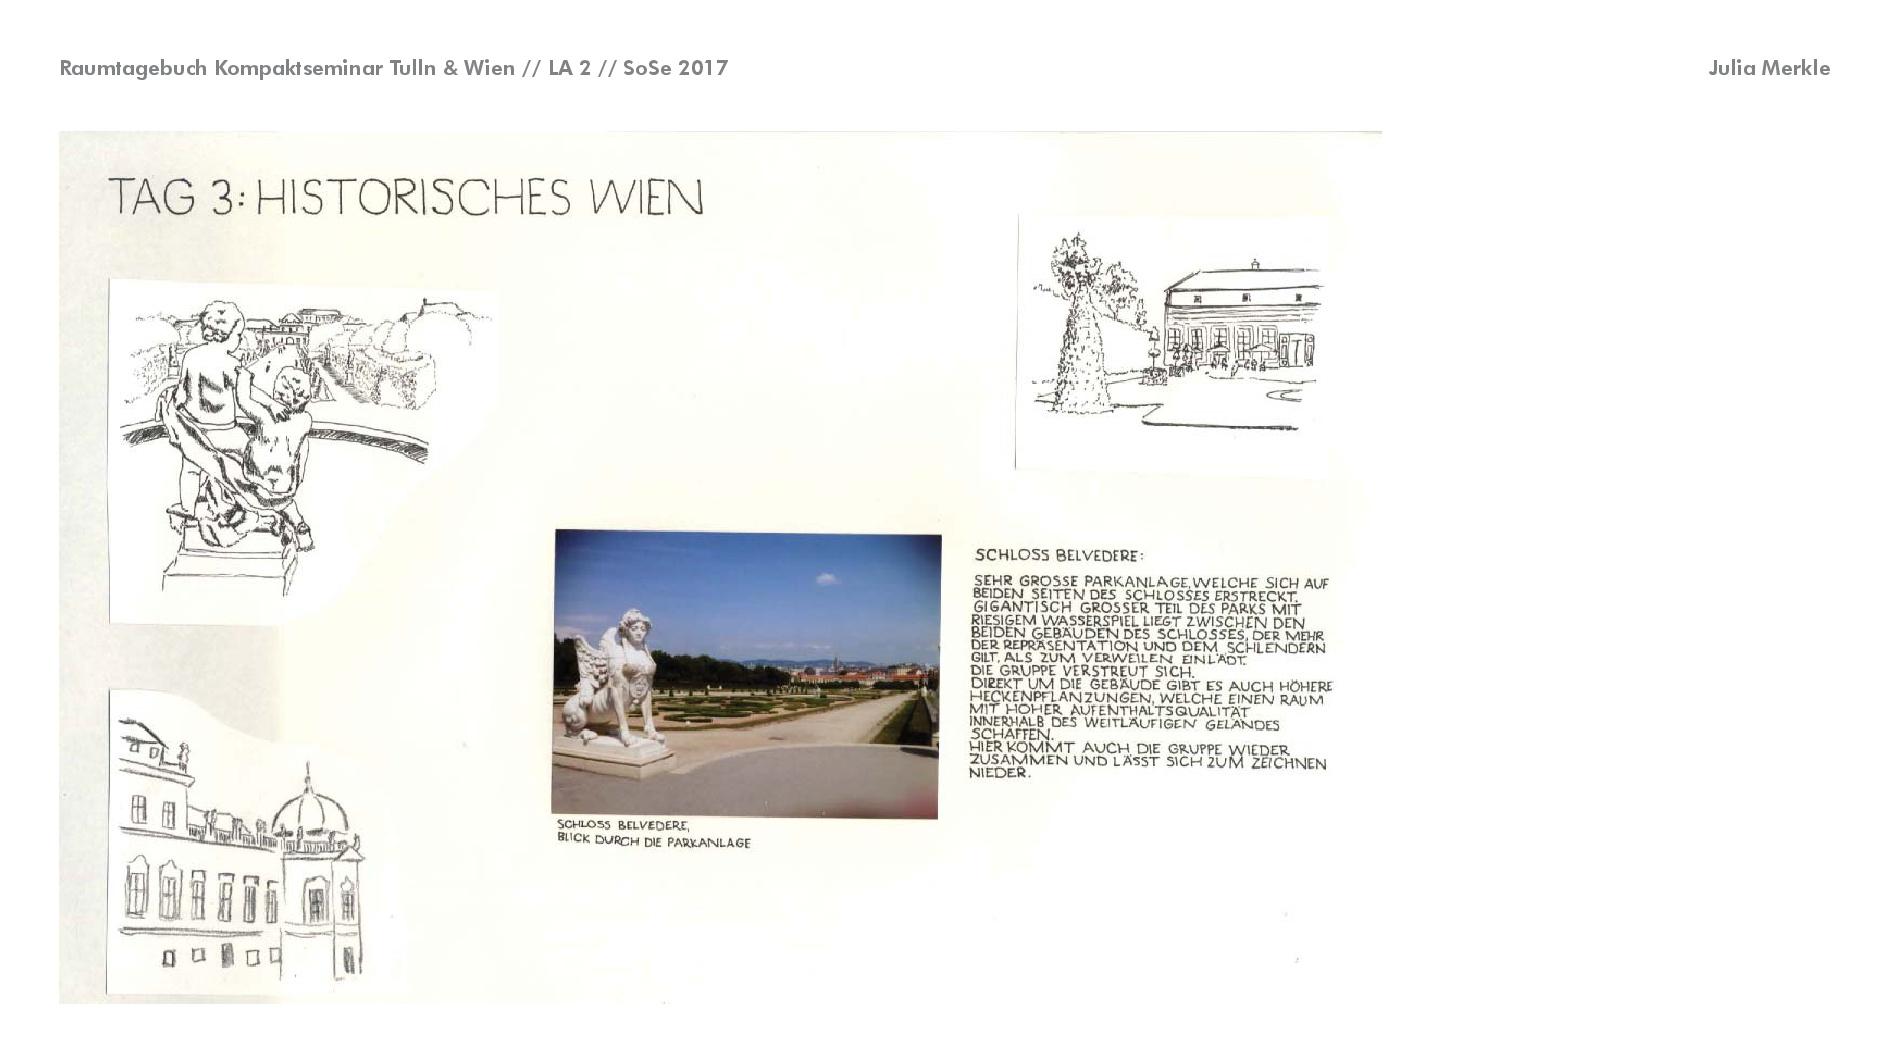 NEU Screen Raumtagebuch Tulln Wien SoSe 17 024